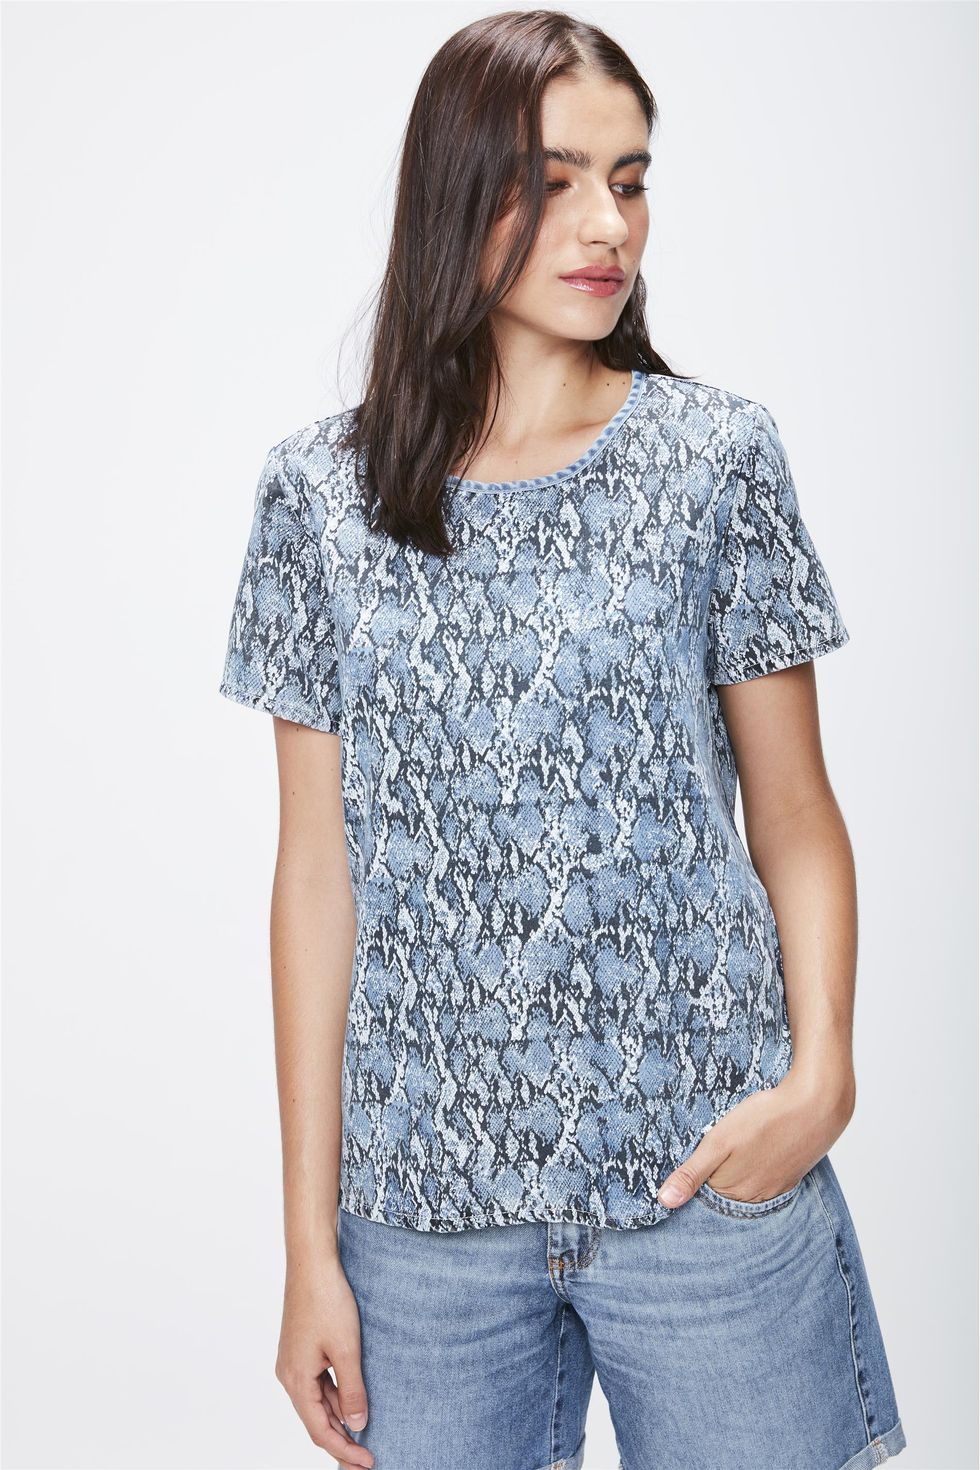 Camiseta-Feminina-Animal-Print-Frente--